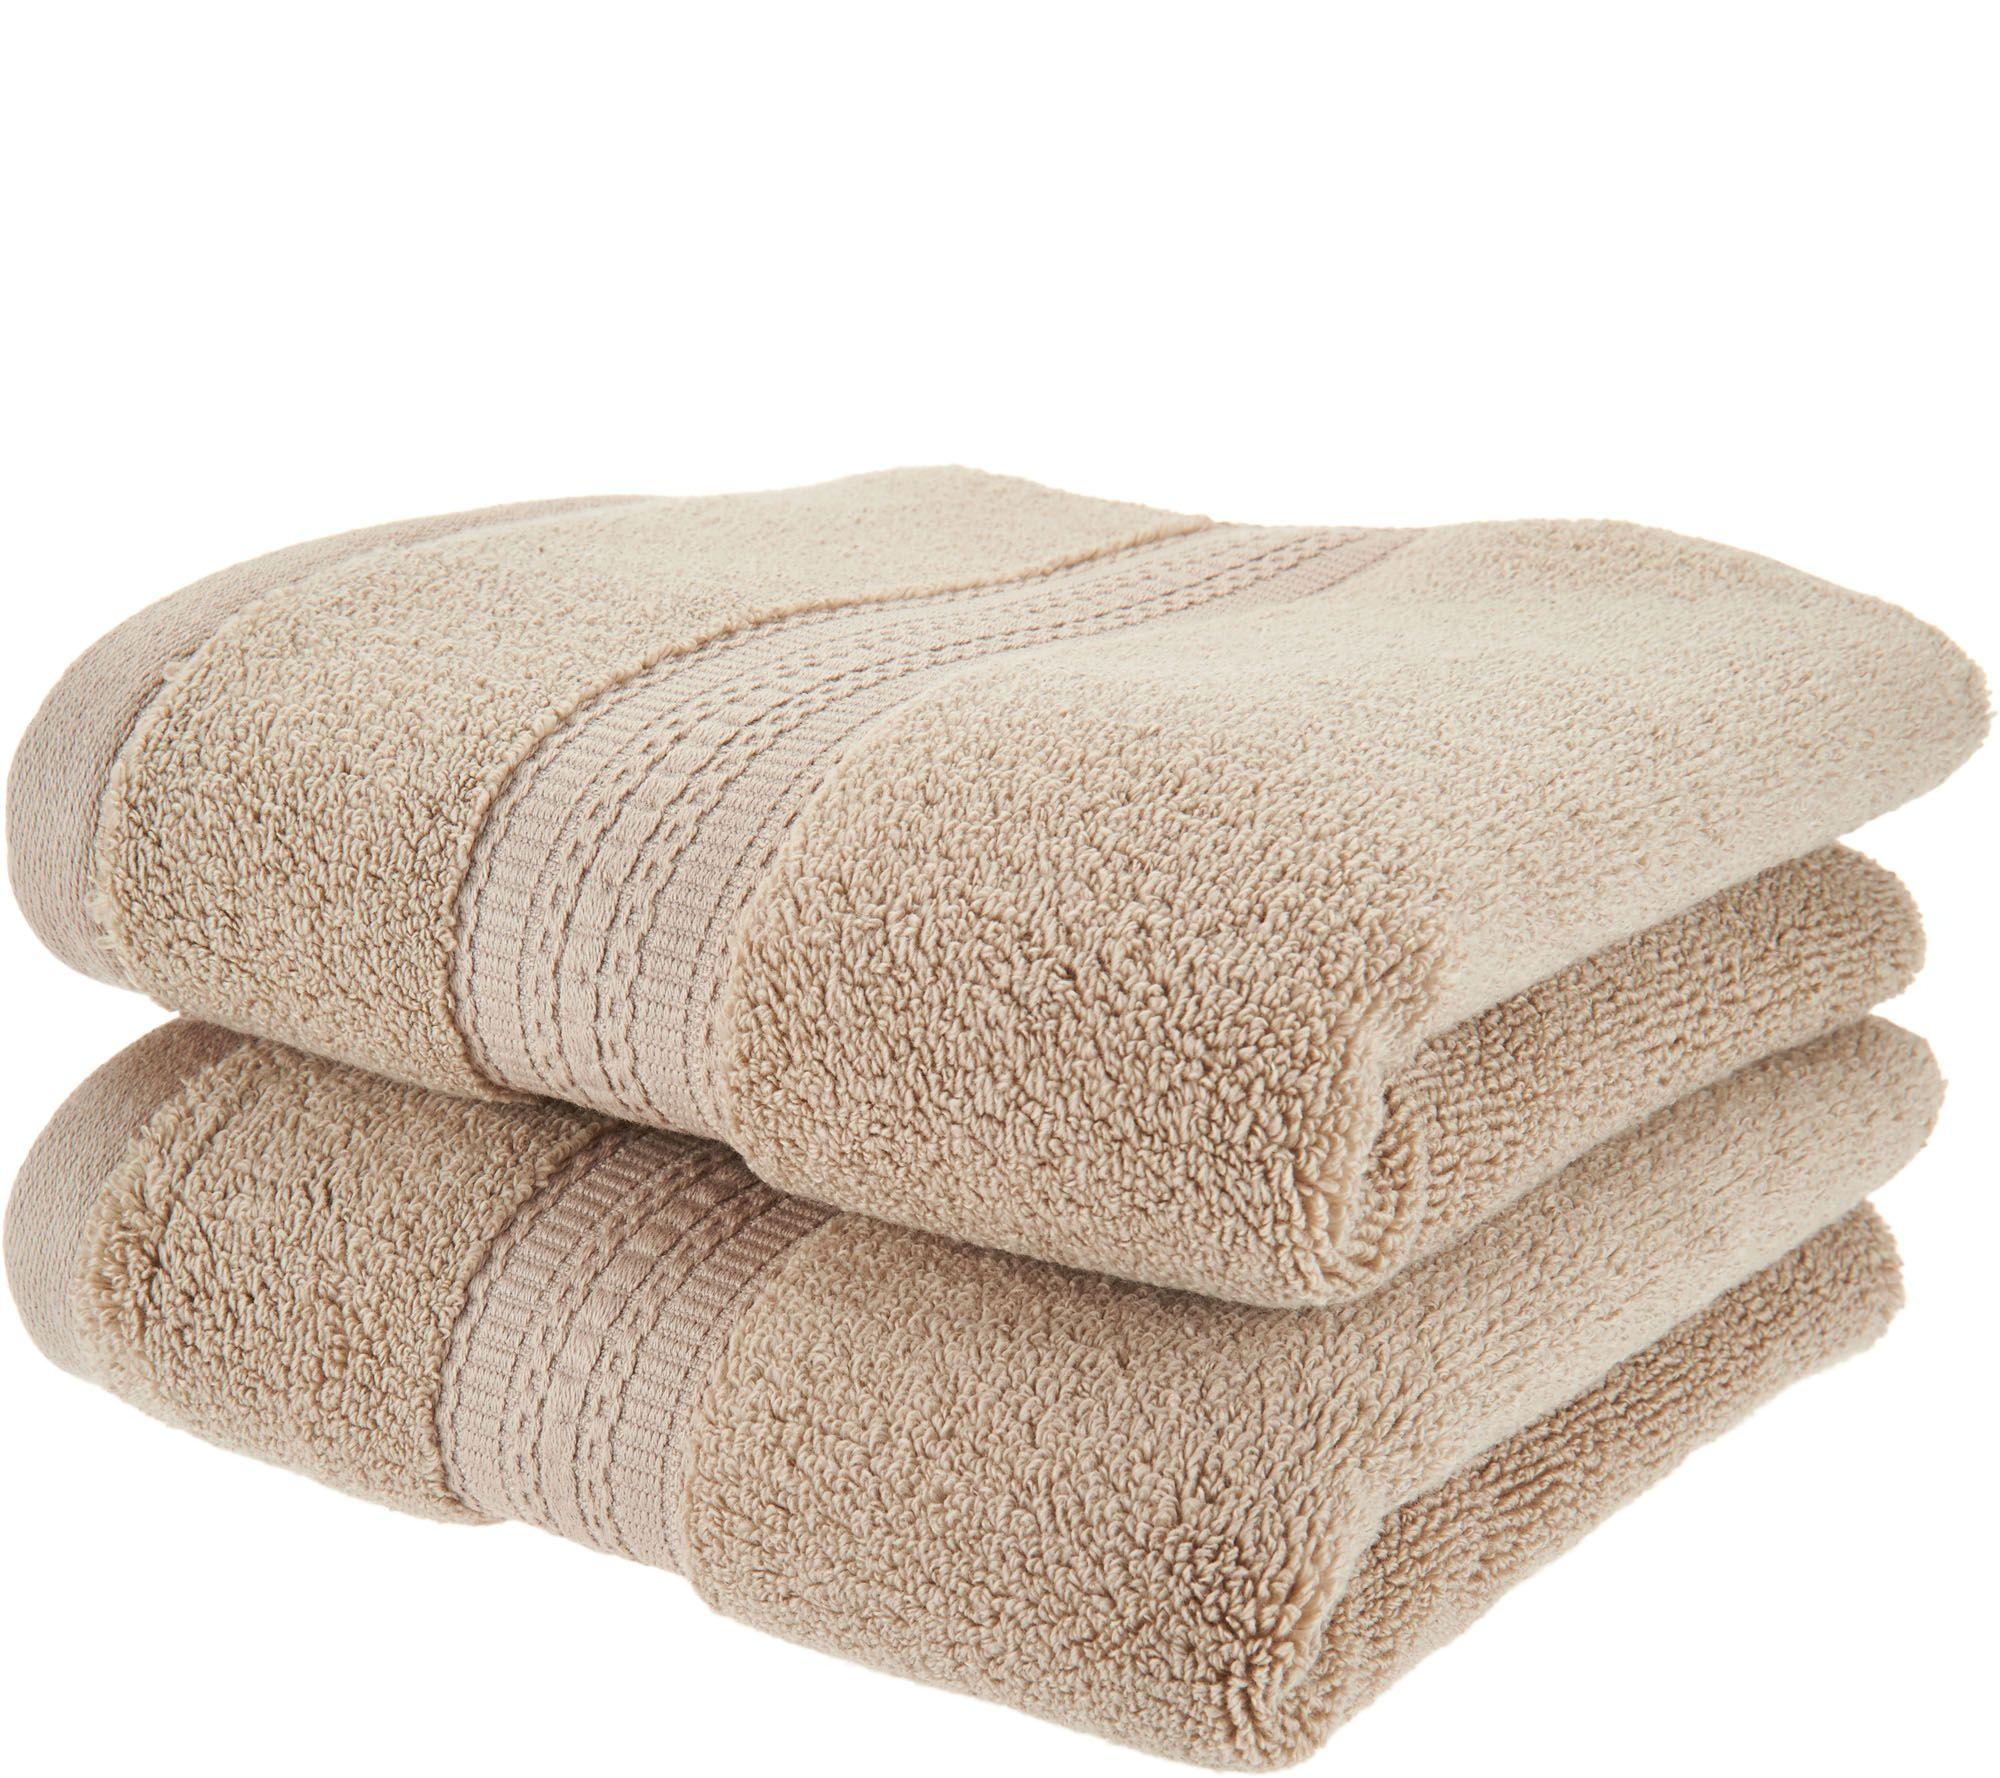 Northern Nights 8 Piece Luxury 100% Cotton Generous Size Bath Towel Set -  Page 1  QVC.com